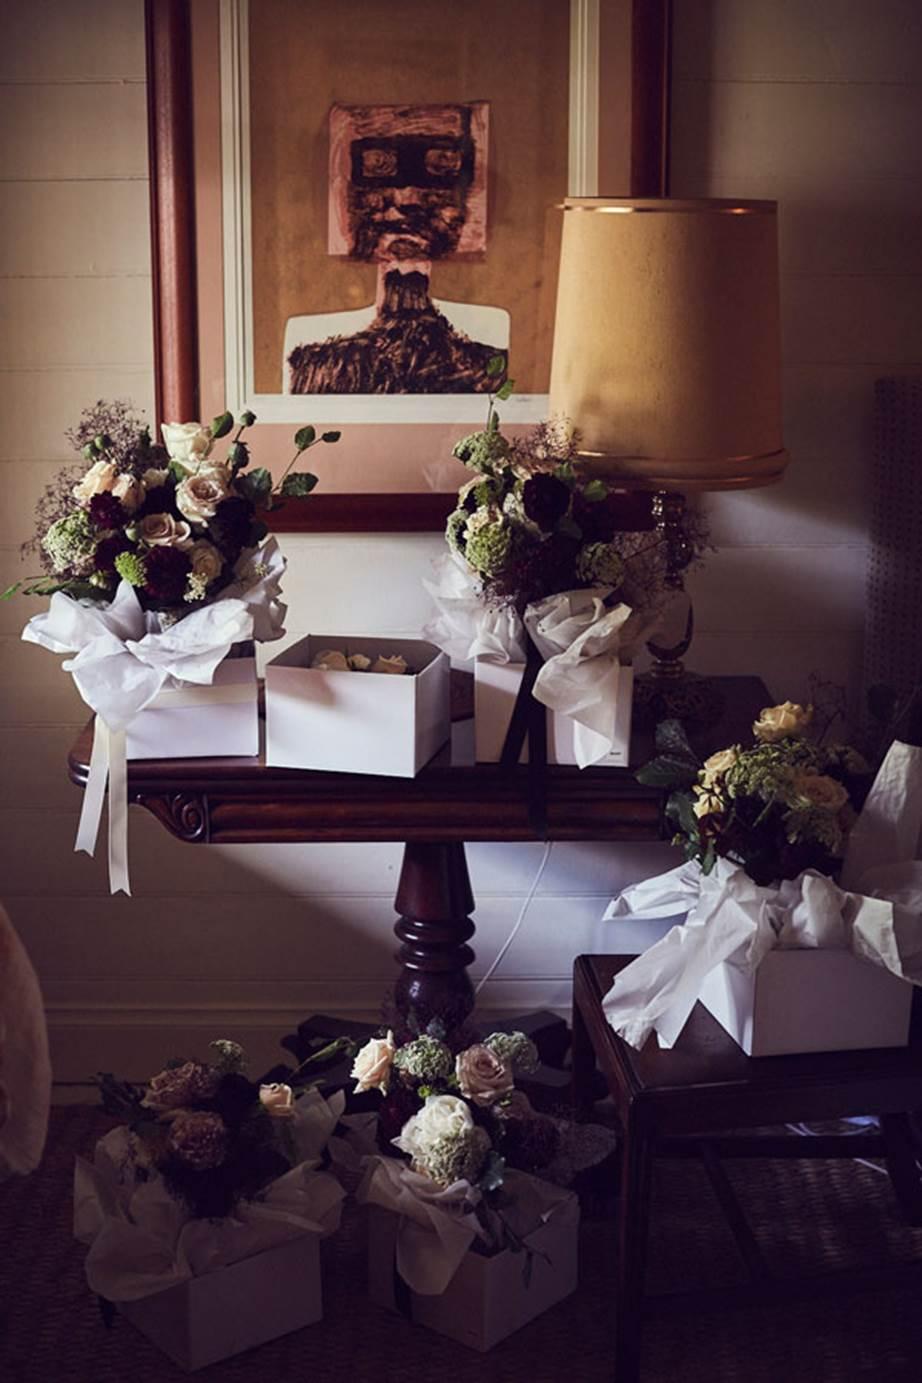 Hopewood House - Weddings  - Harpers Bazaar - Woodland Wedding in the Souther Highlands - Alyssa and Adriano - Botanicals.jpg